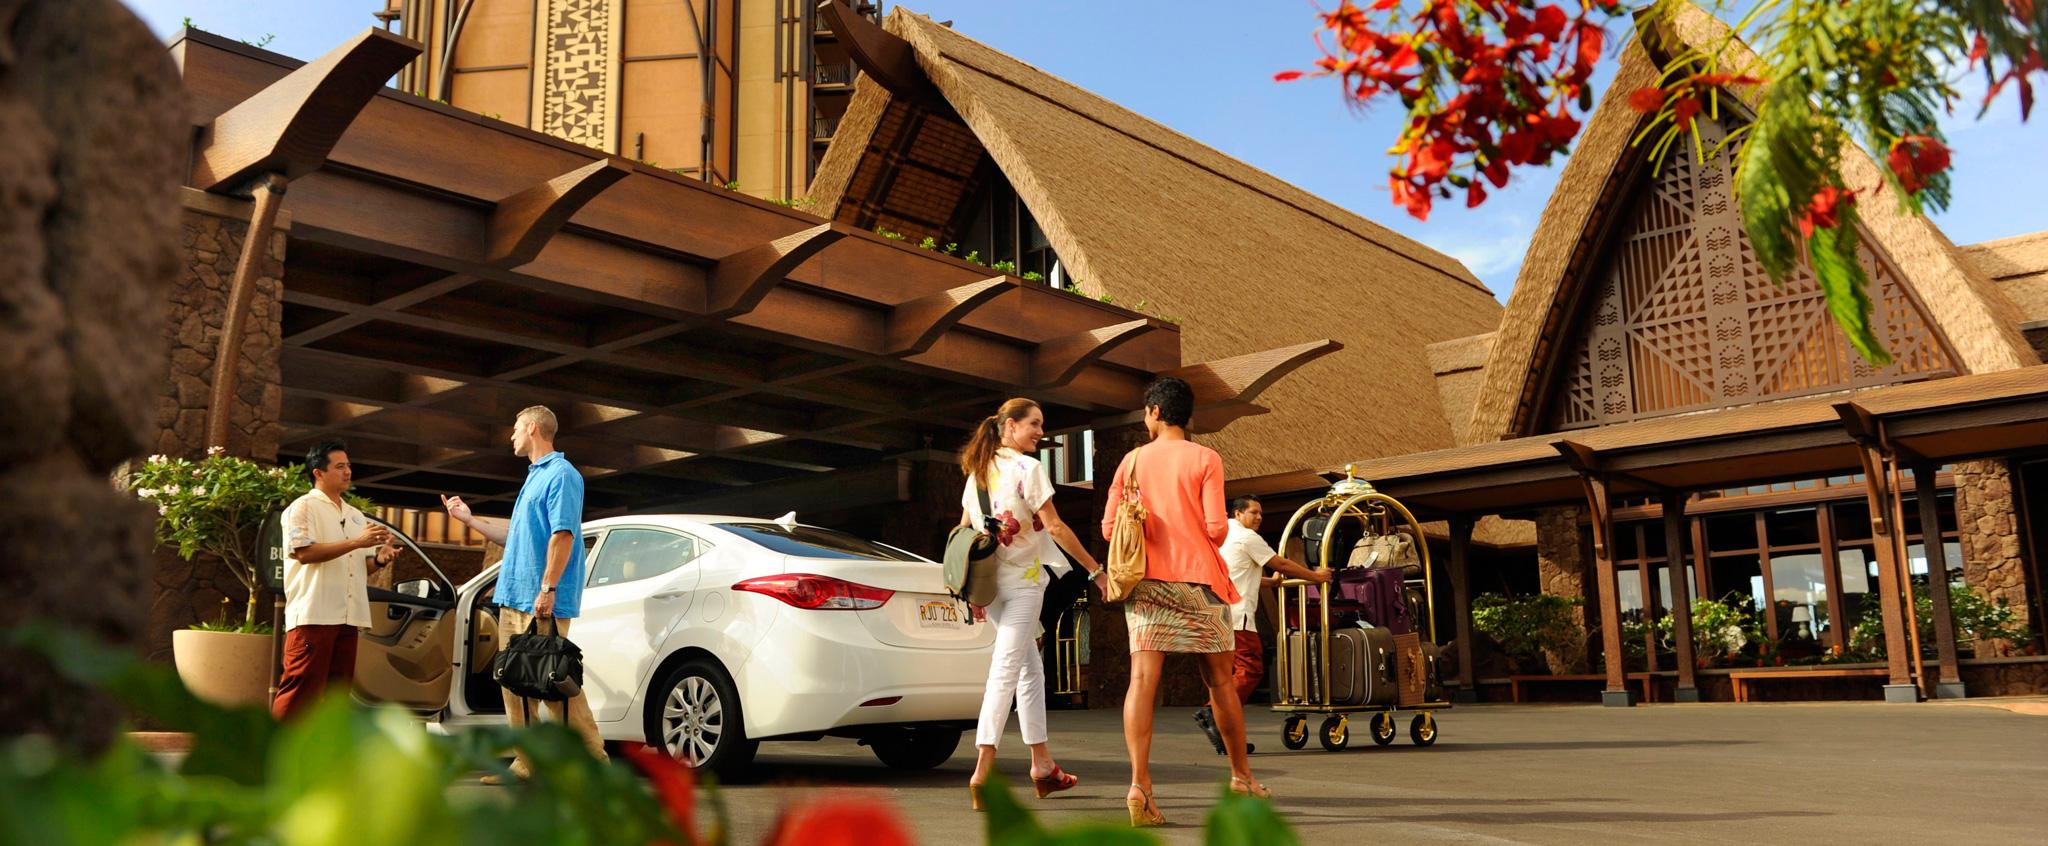 Parking Amp Transportation Aulani Hawaii Resort Amp Spa